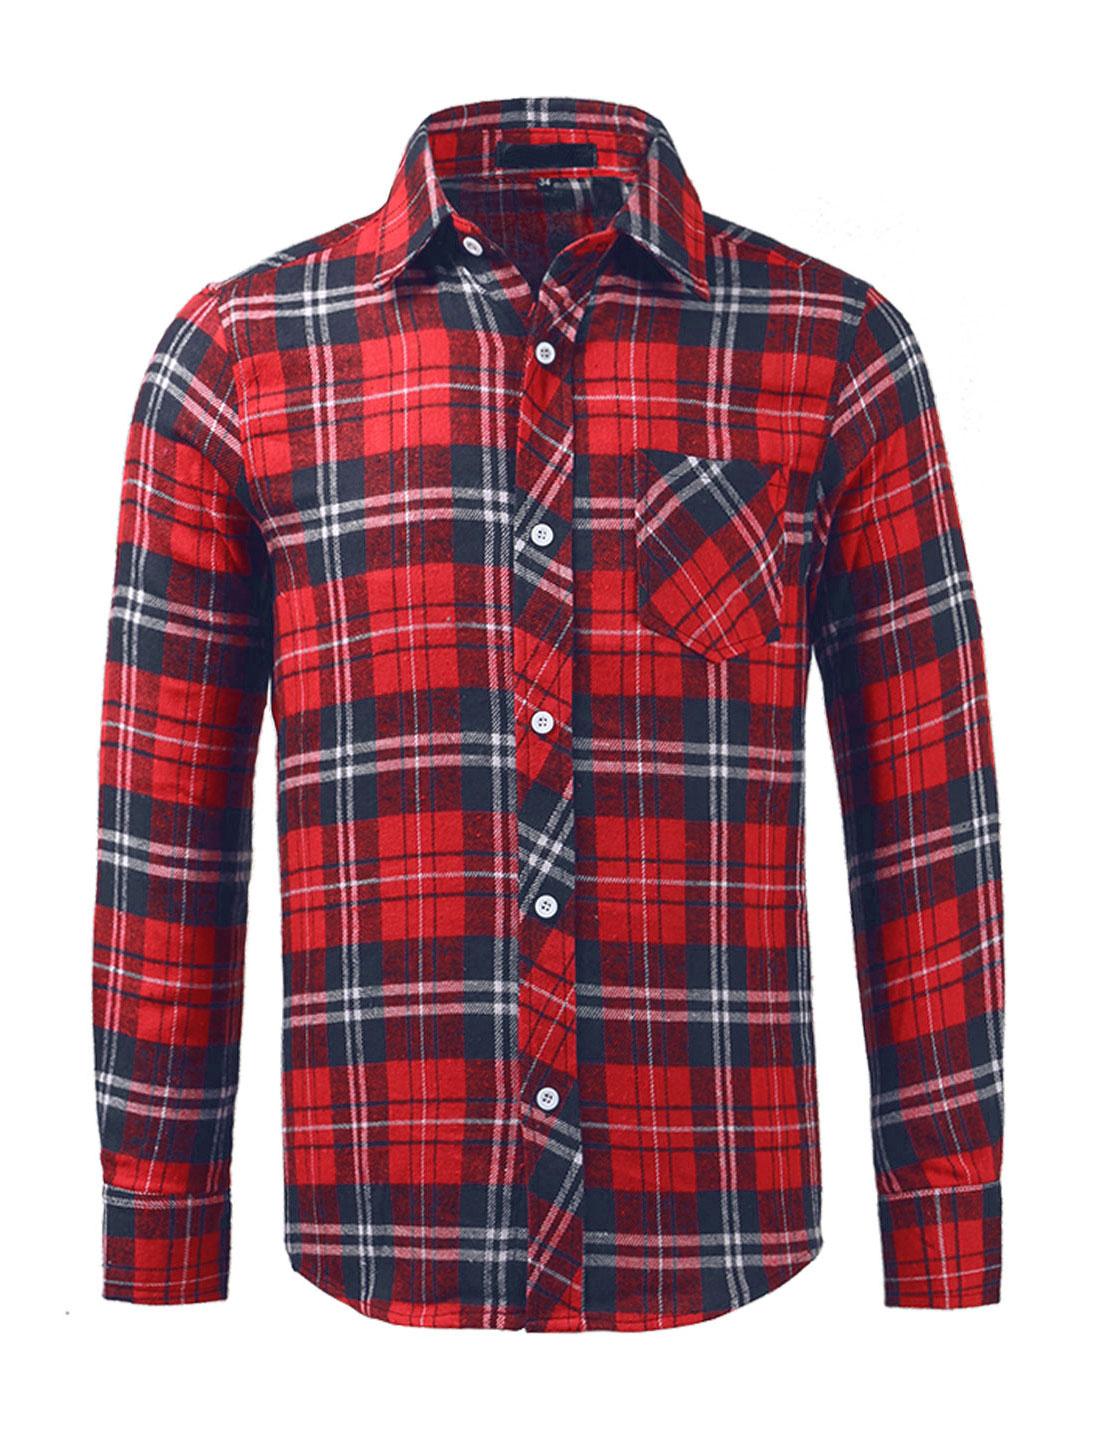 Man Single Breasted Round Hem Chest Pocket Check Print Shirt Red-Blue M